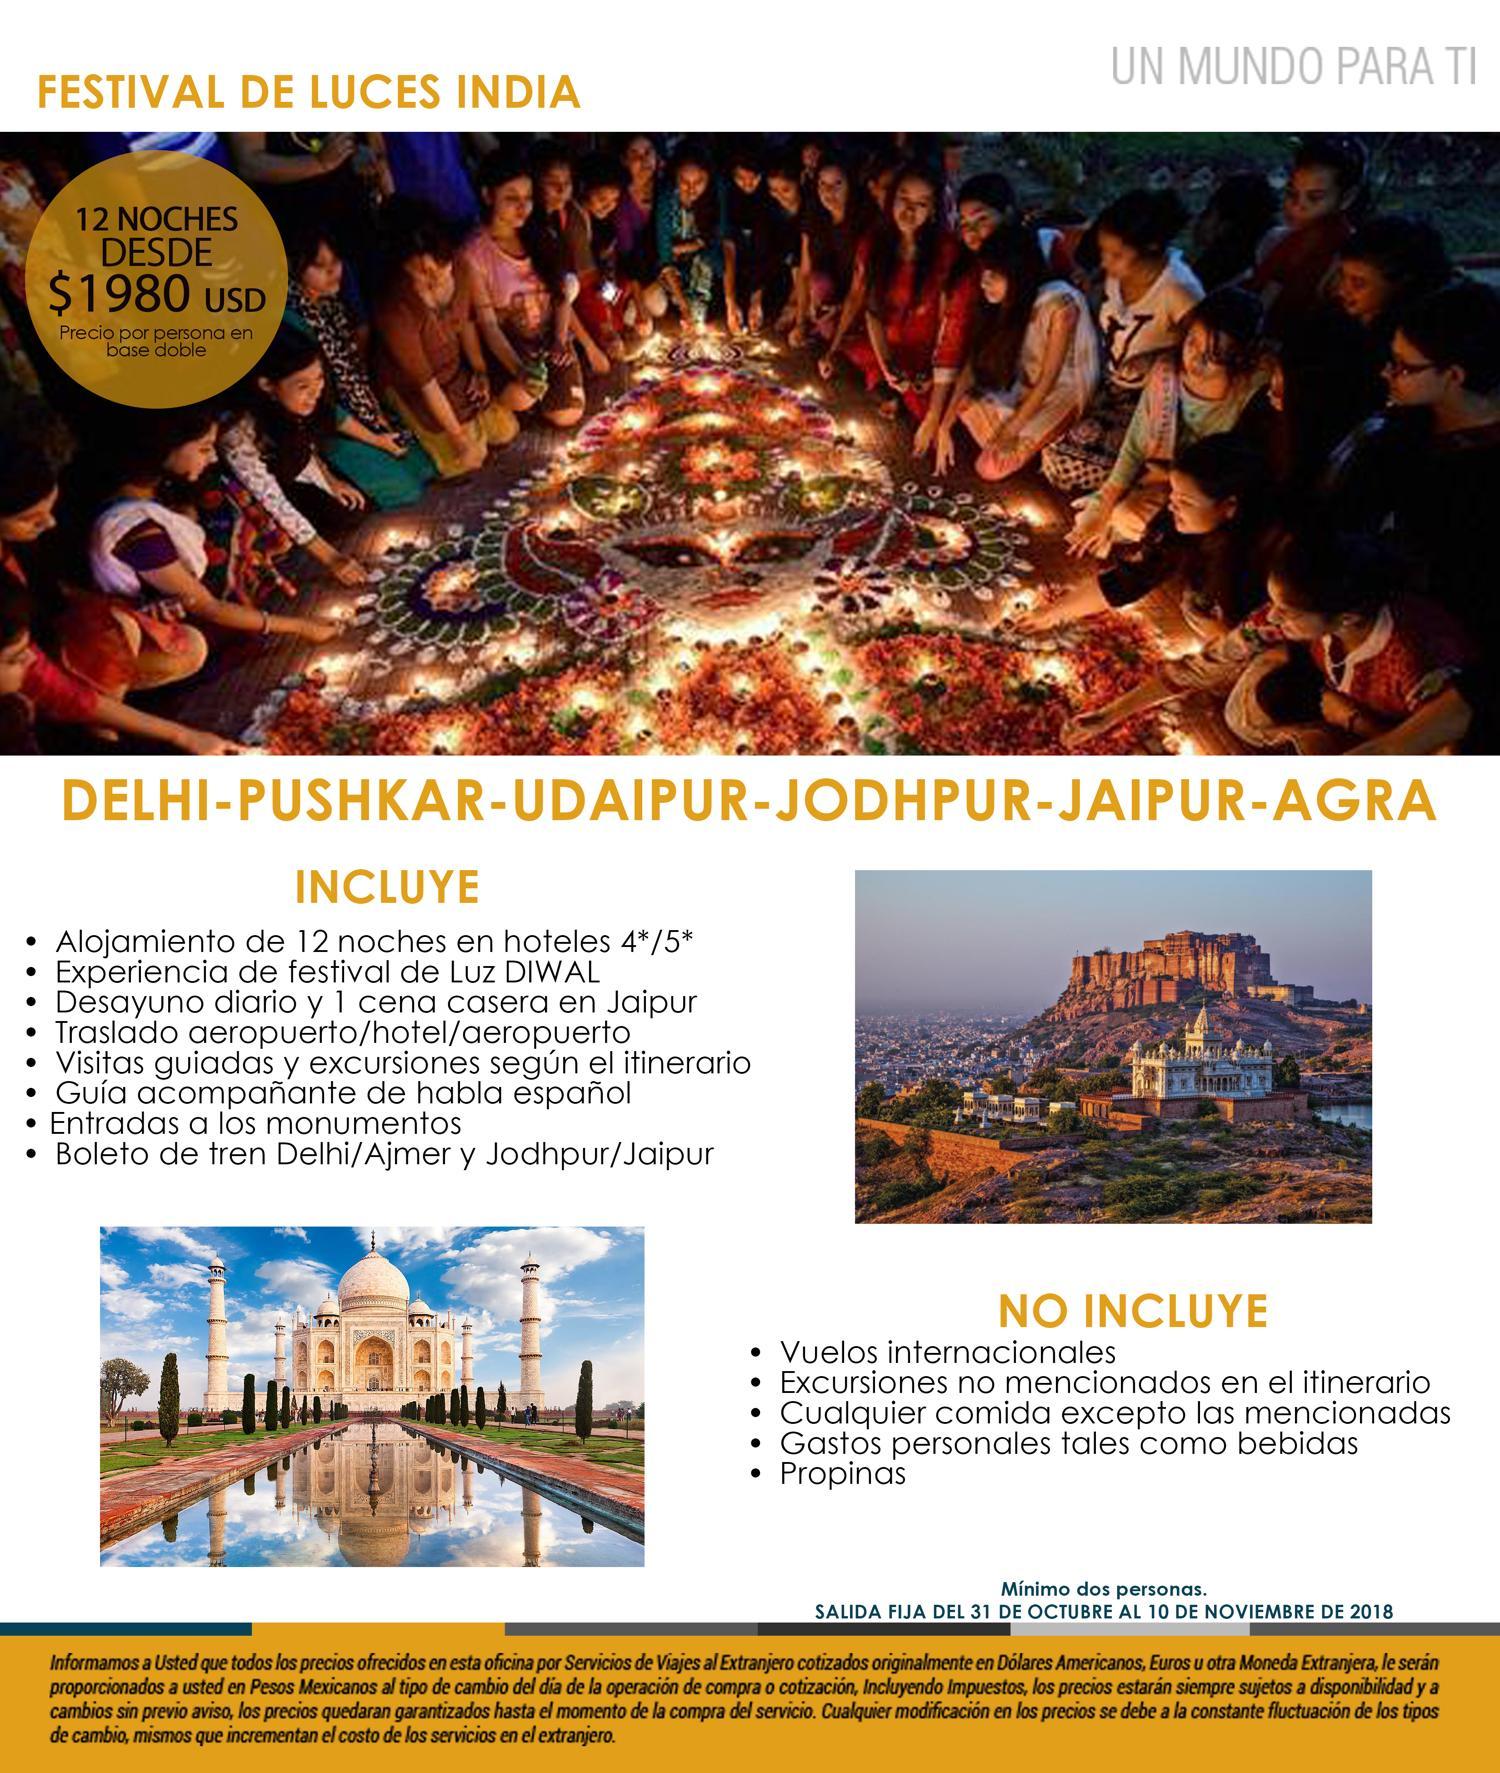 Festival de Luces India